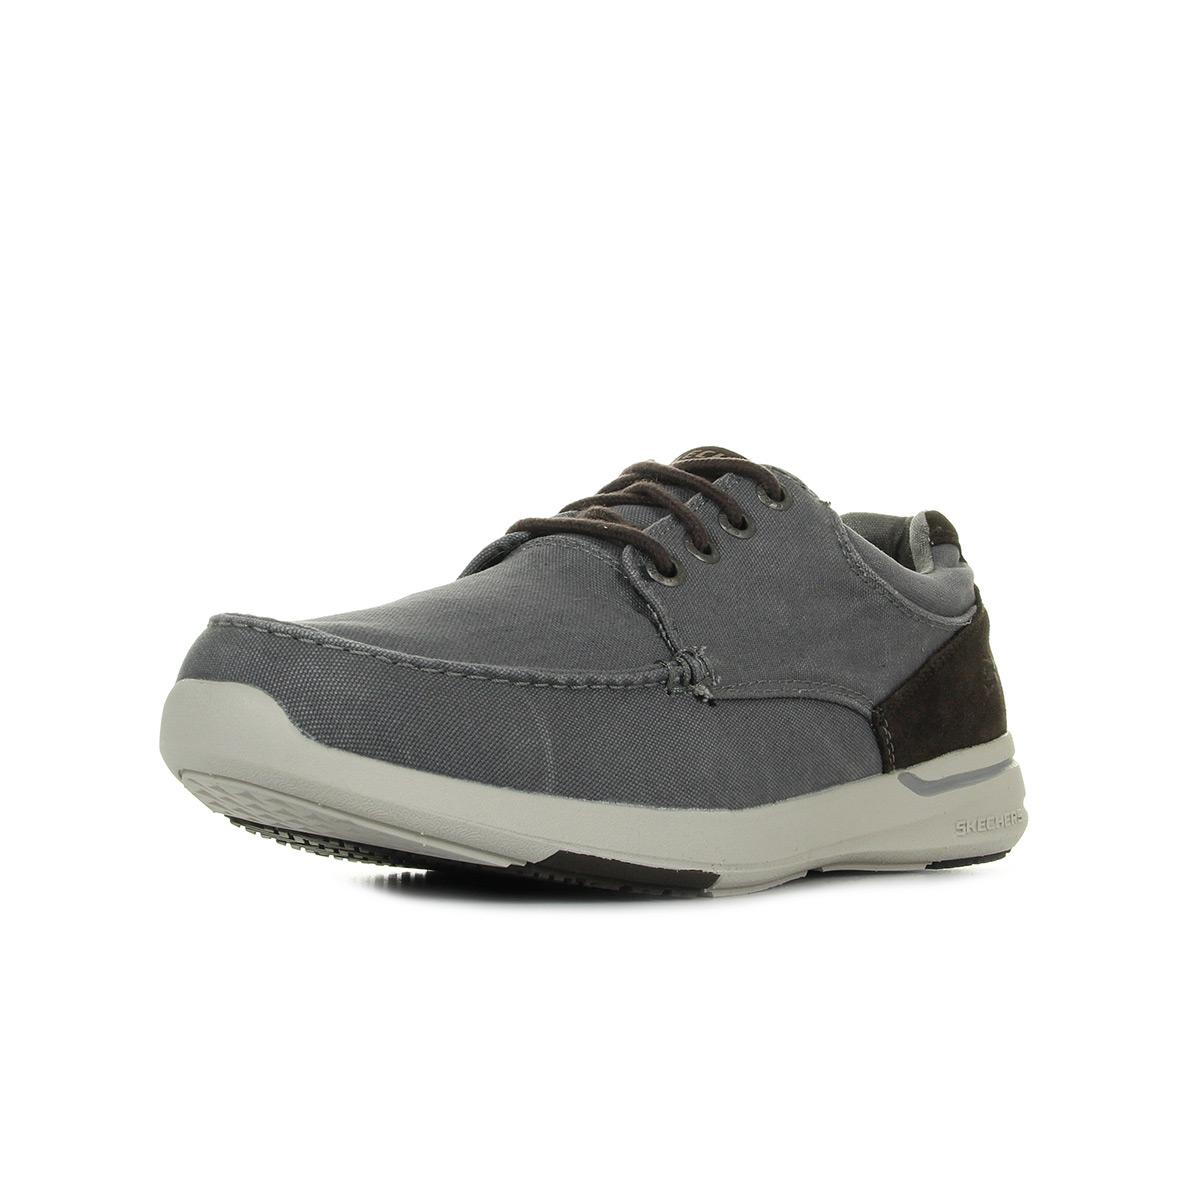 Hommes Chaussures Bateau Elent-arven Skechers ypiME